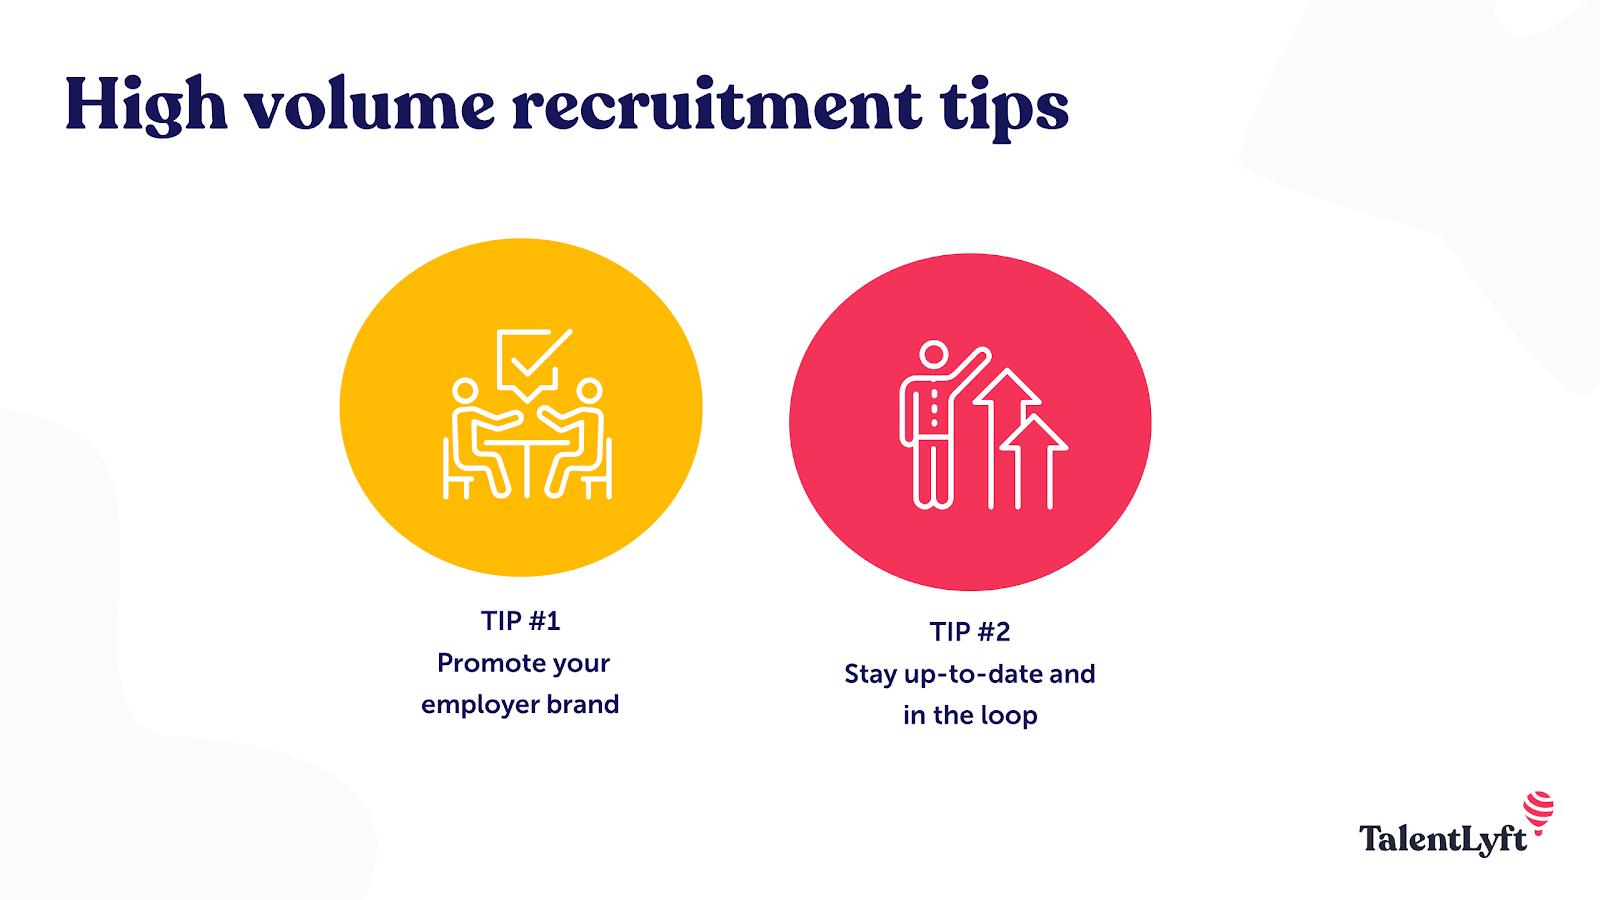 High volume recruiting tips